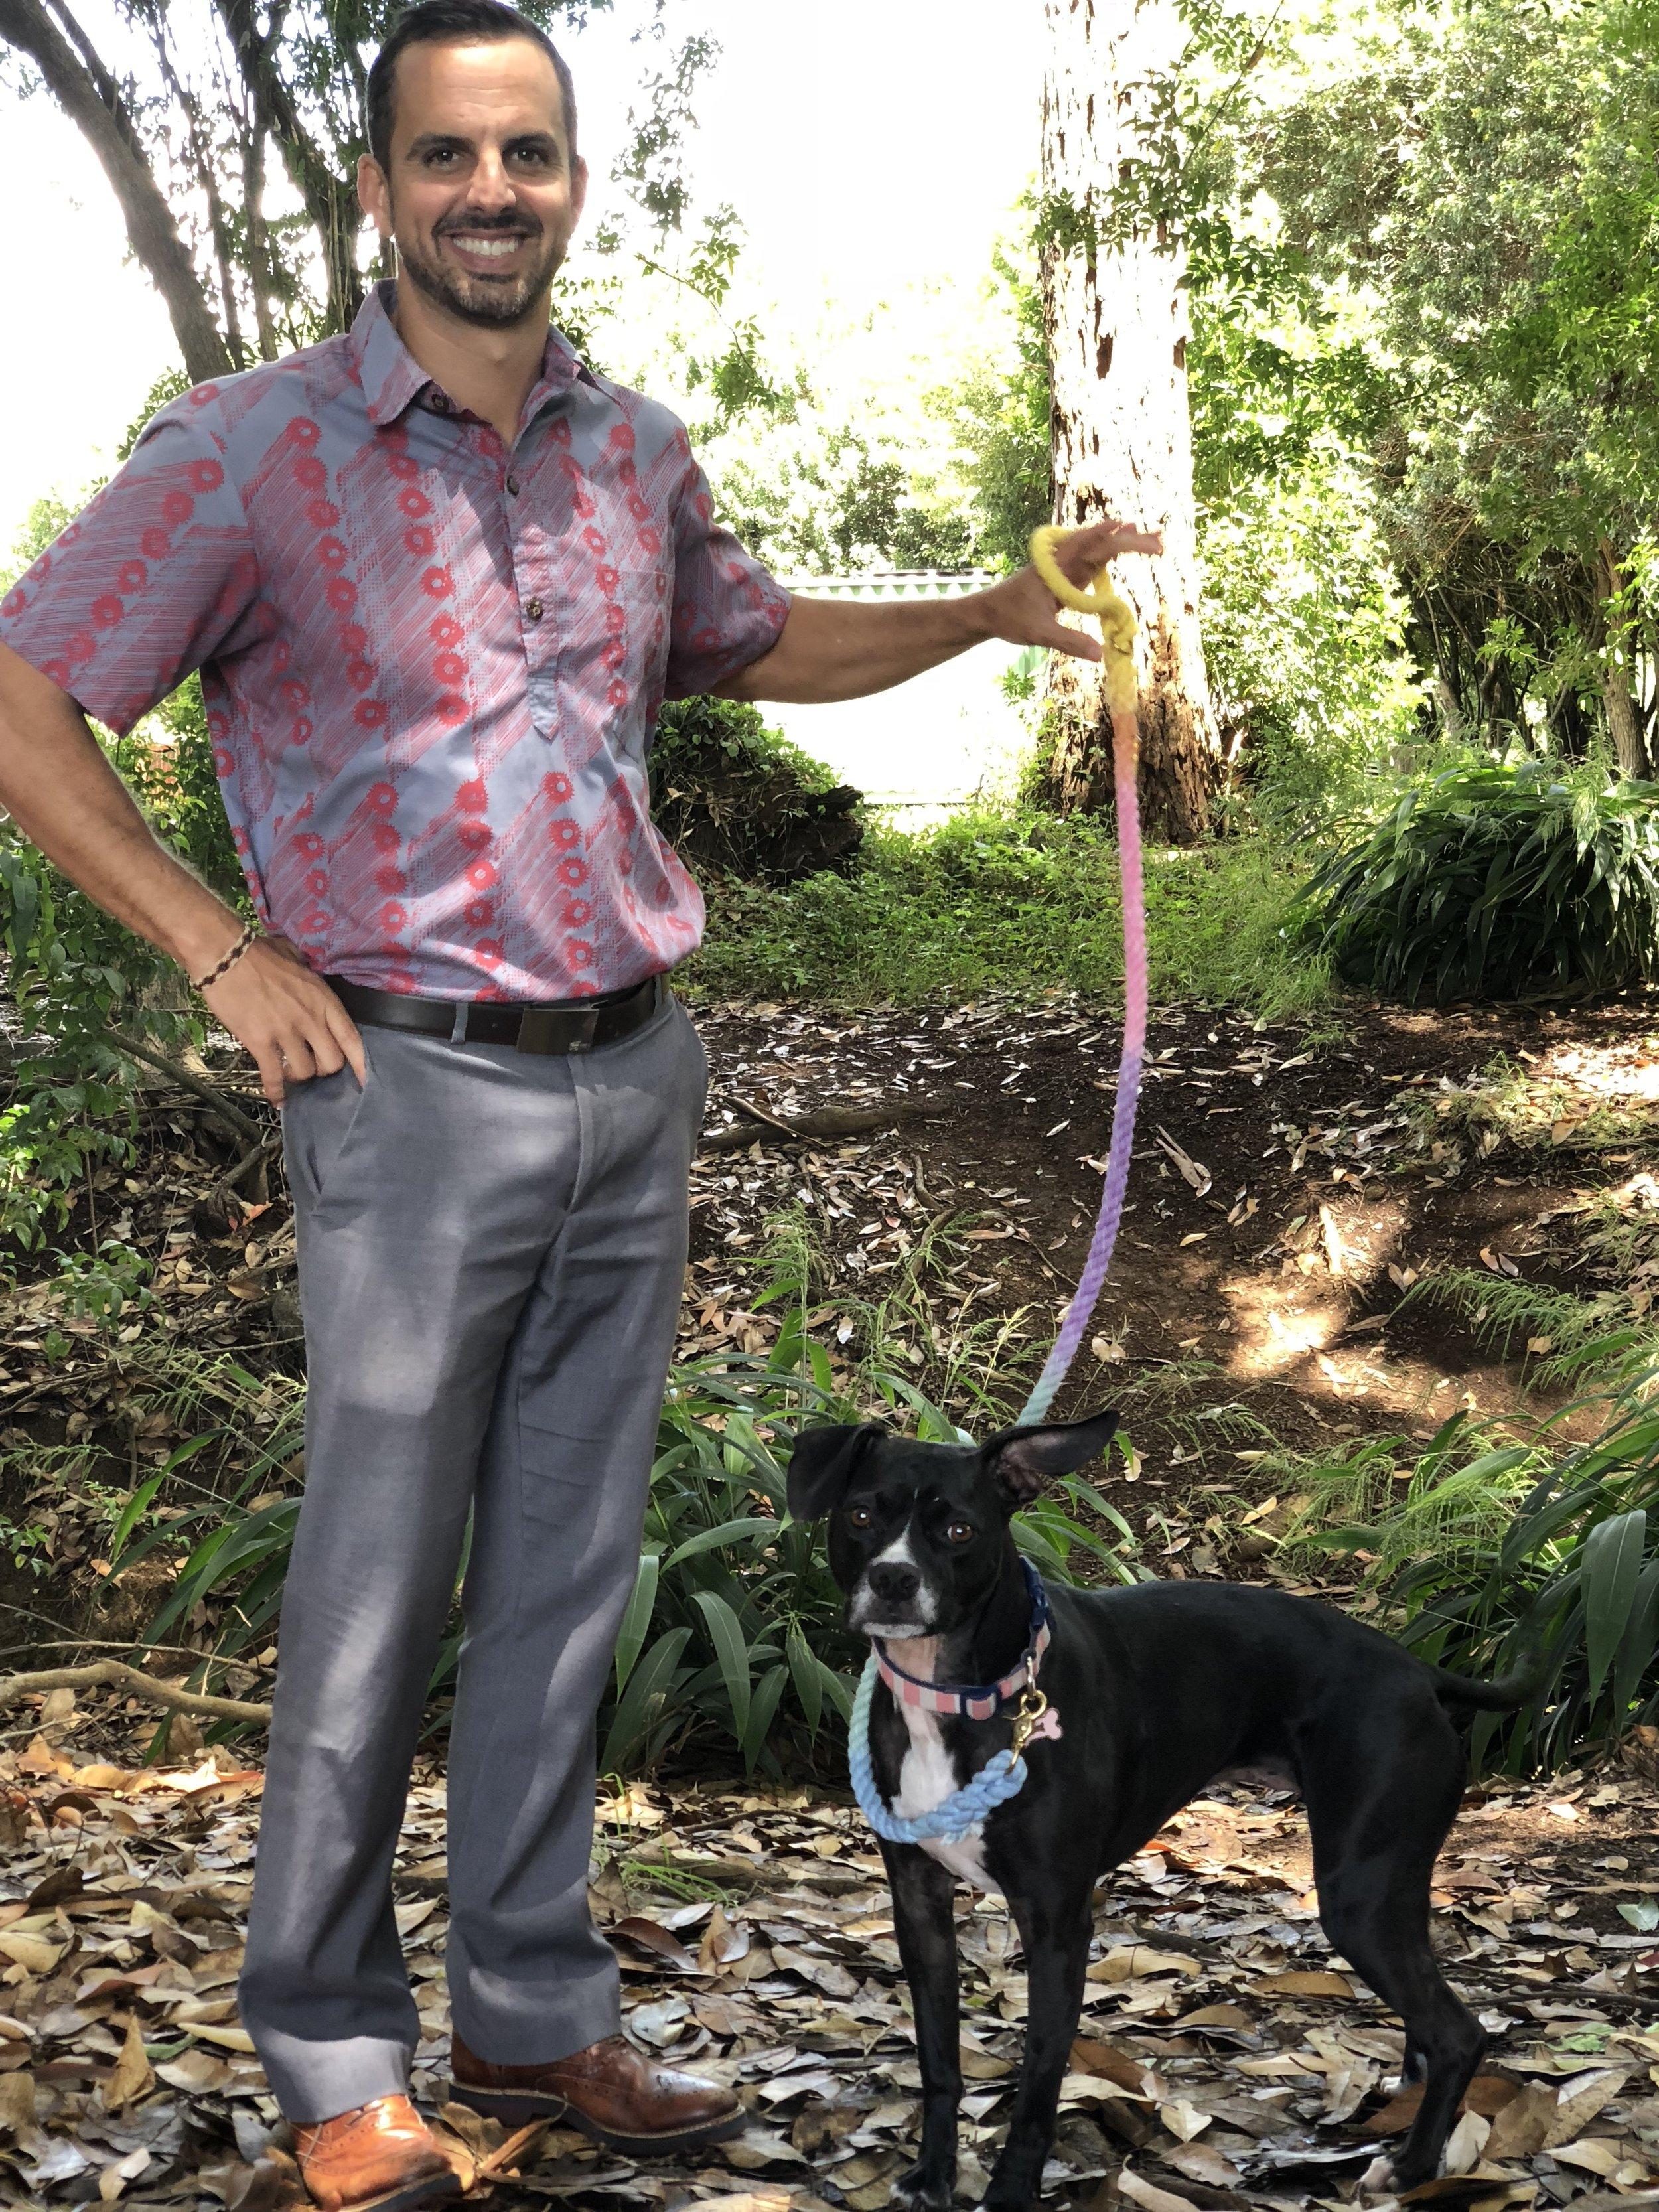 John and his dog Hanai